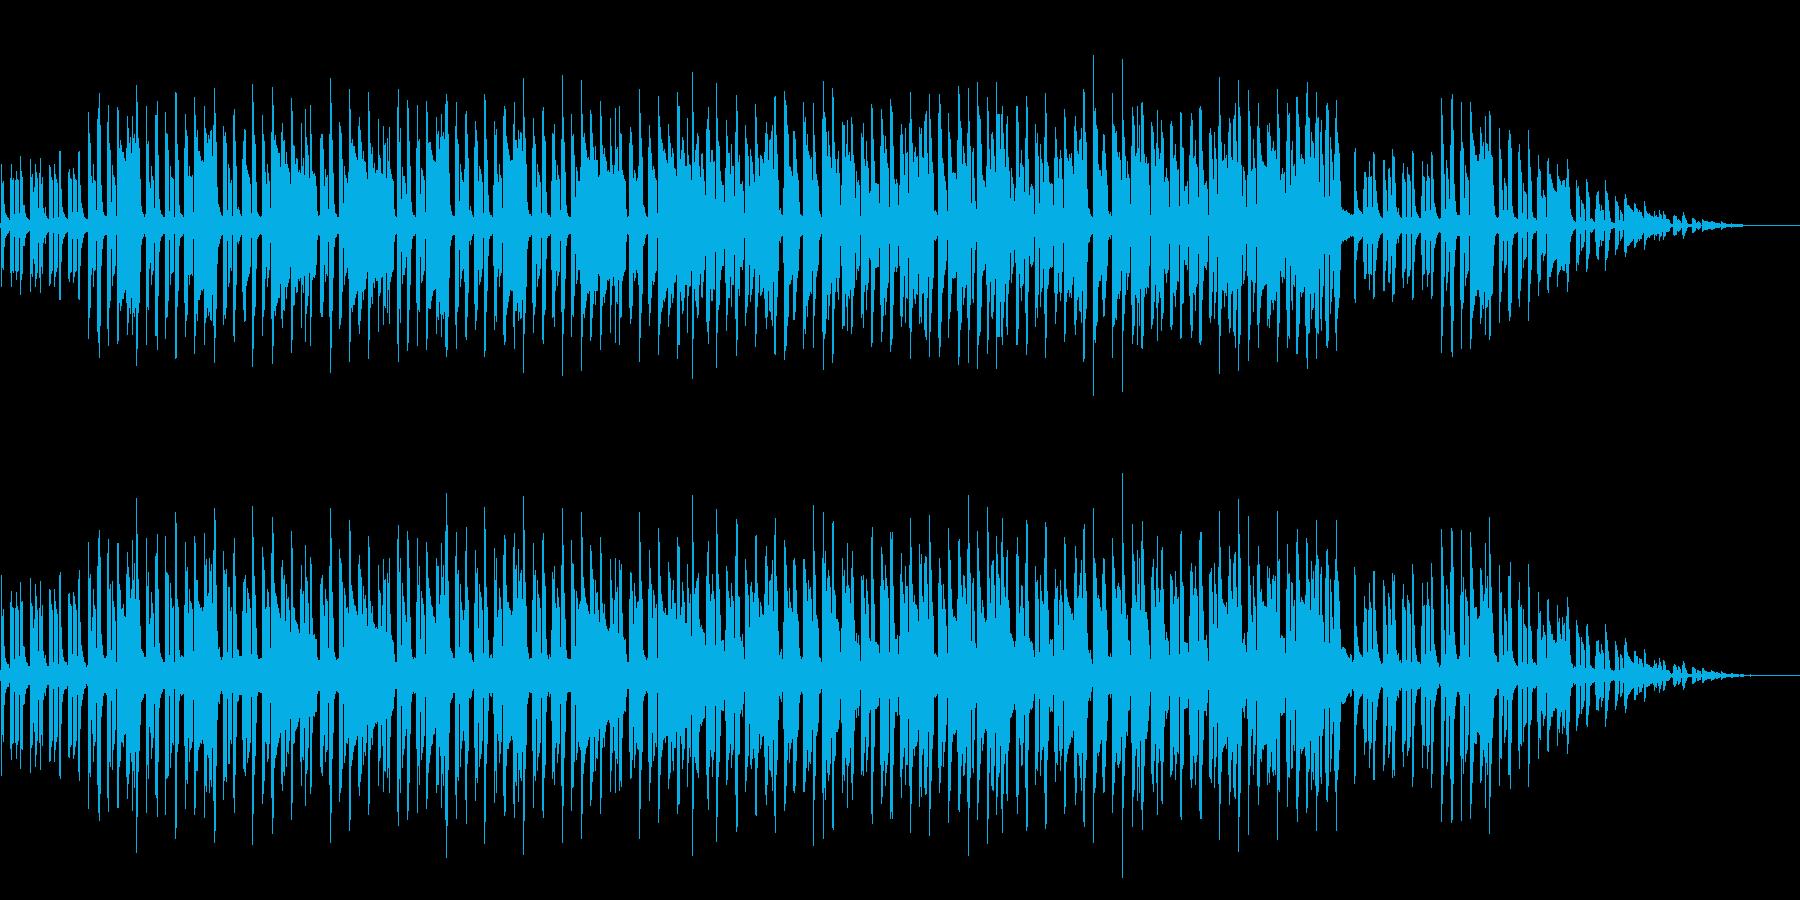 8bitクラシック-小さな白鳥たちの踊りの再生済みの波形